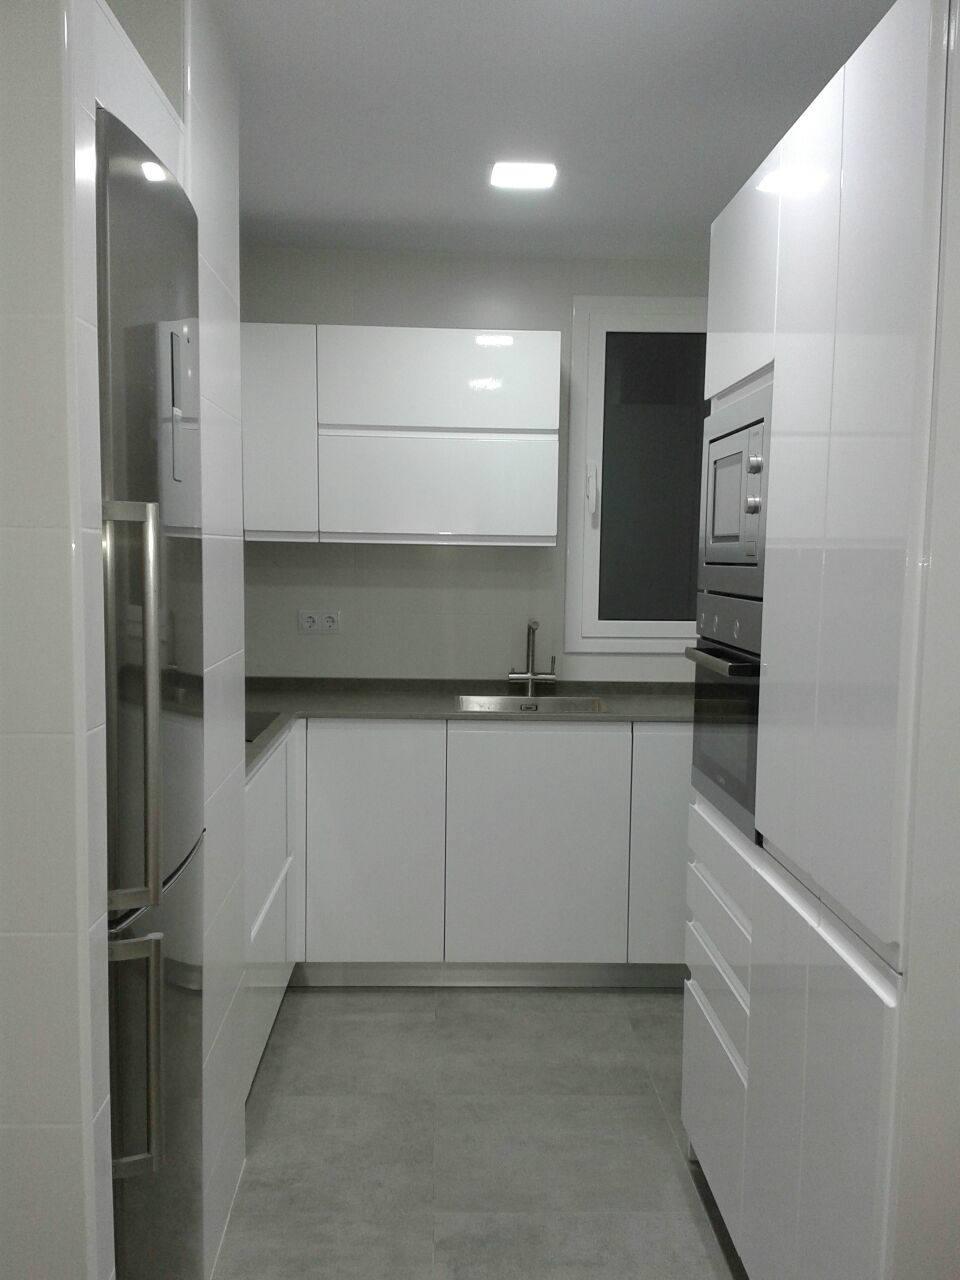 cocina que aprovecha al máximo espacio pequeño